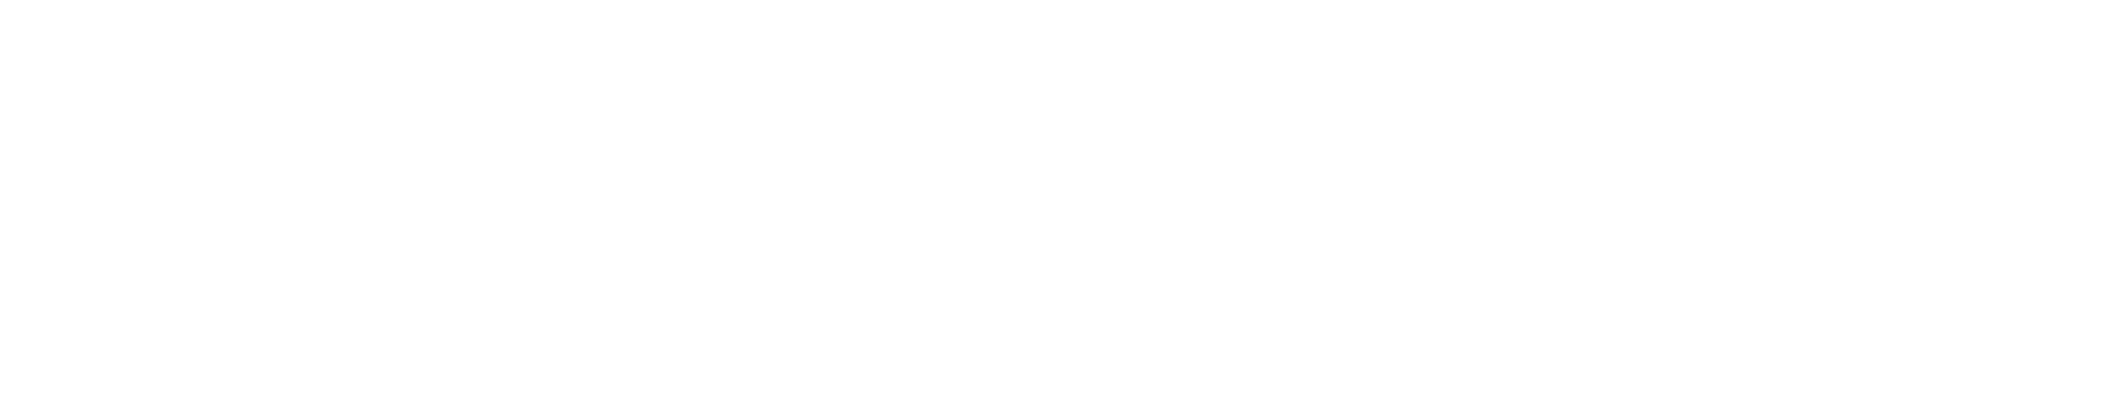 statistiques-icone